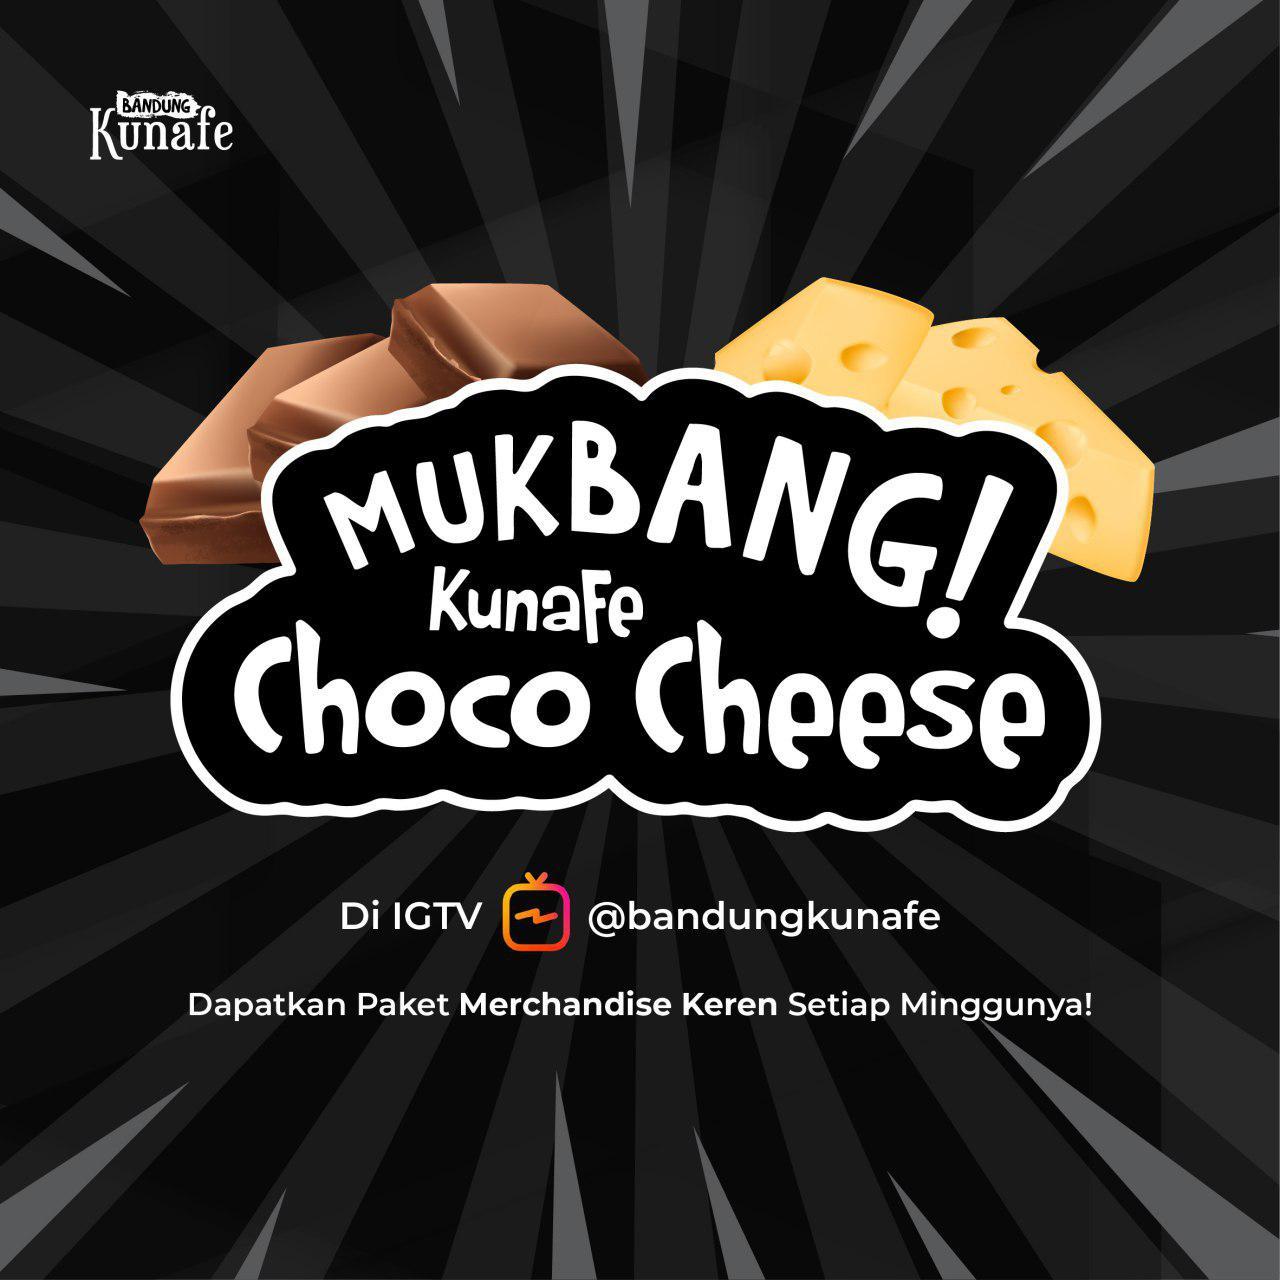 Lomba Mukbang Kunafe Choco Cheese bareng Bandung Kunafe